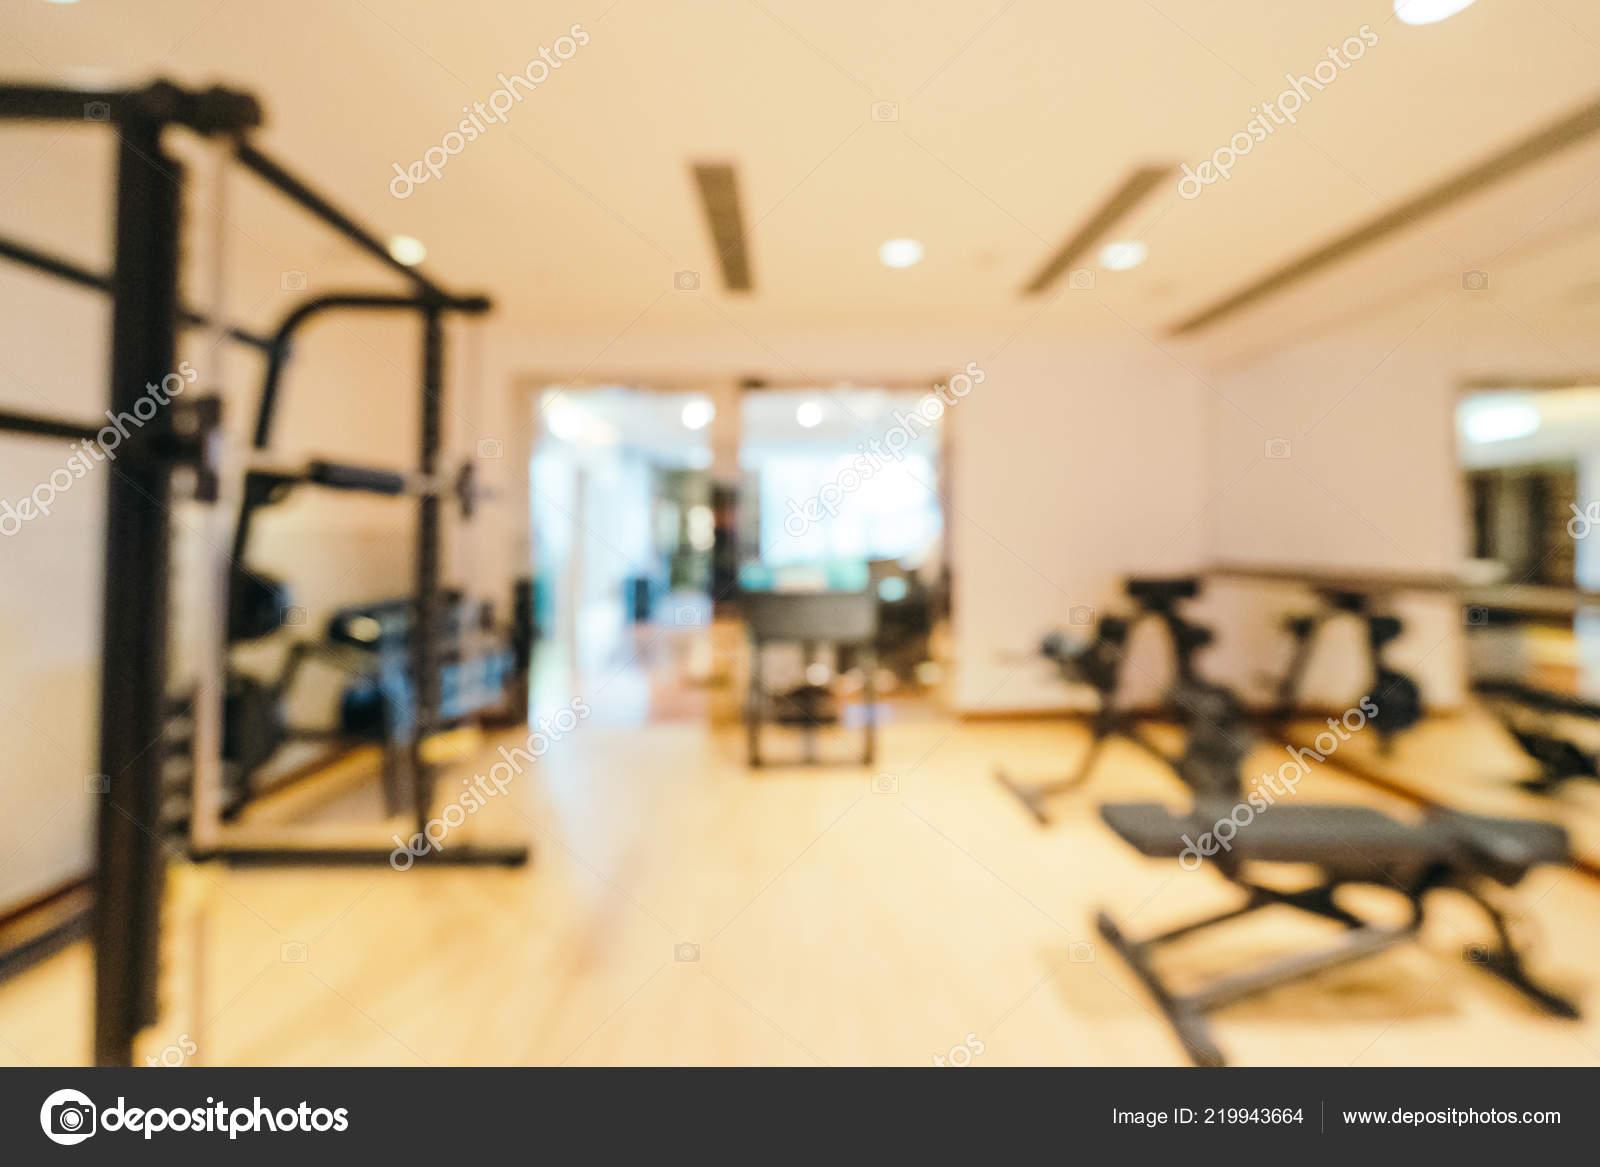 Abstract blur defocused fitness equipment gym room interior